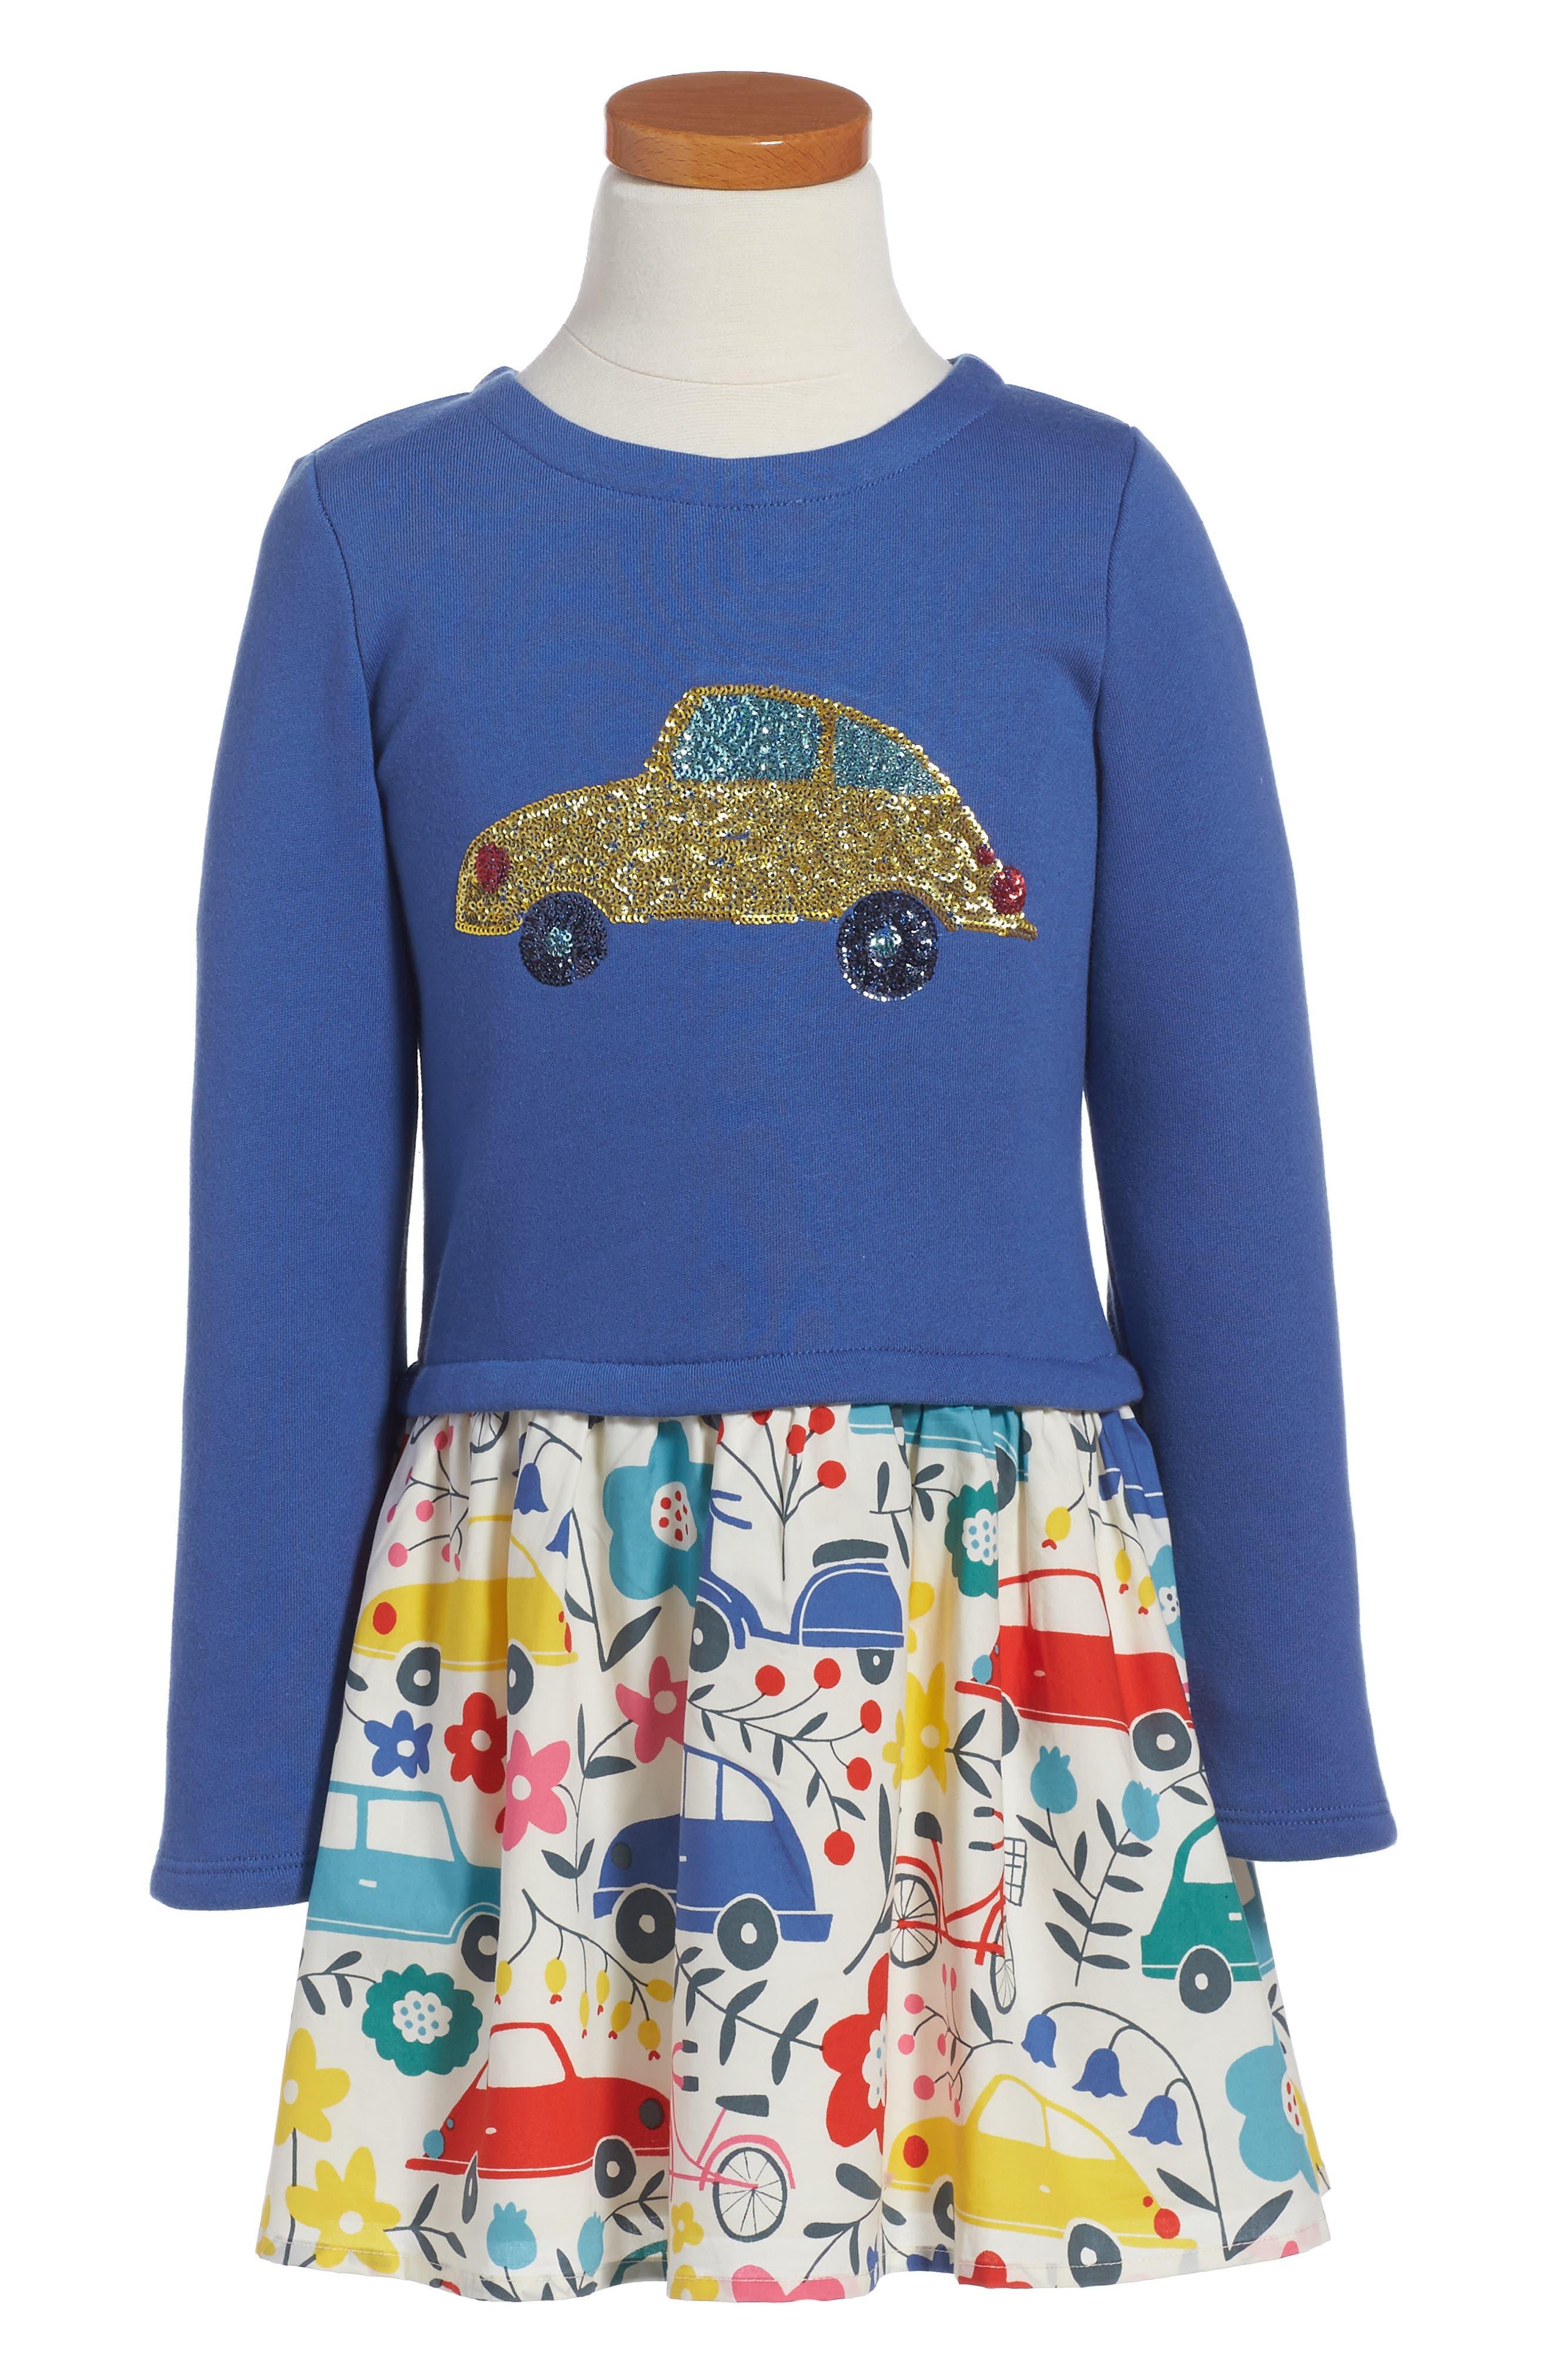 Alternate Image 1 Selected - Mini Boden Sequin Appliqué Dress (Toddler Girls, Little Girls & Big Girls)